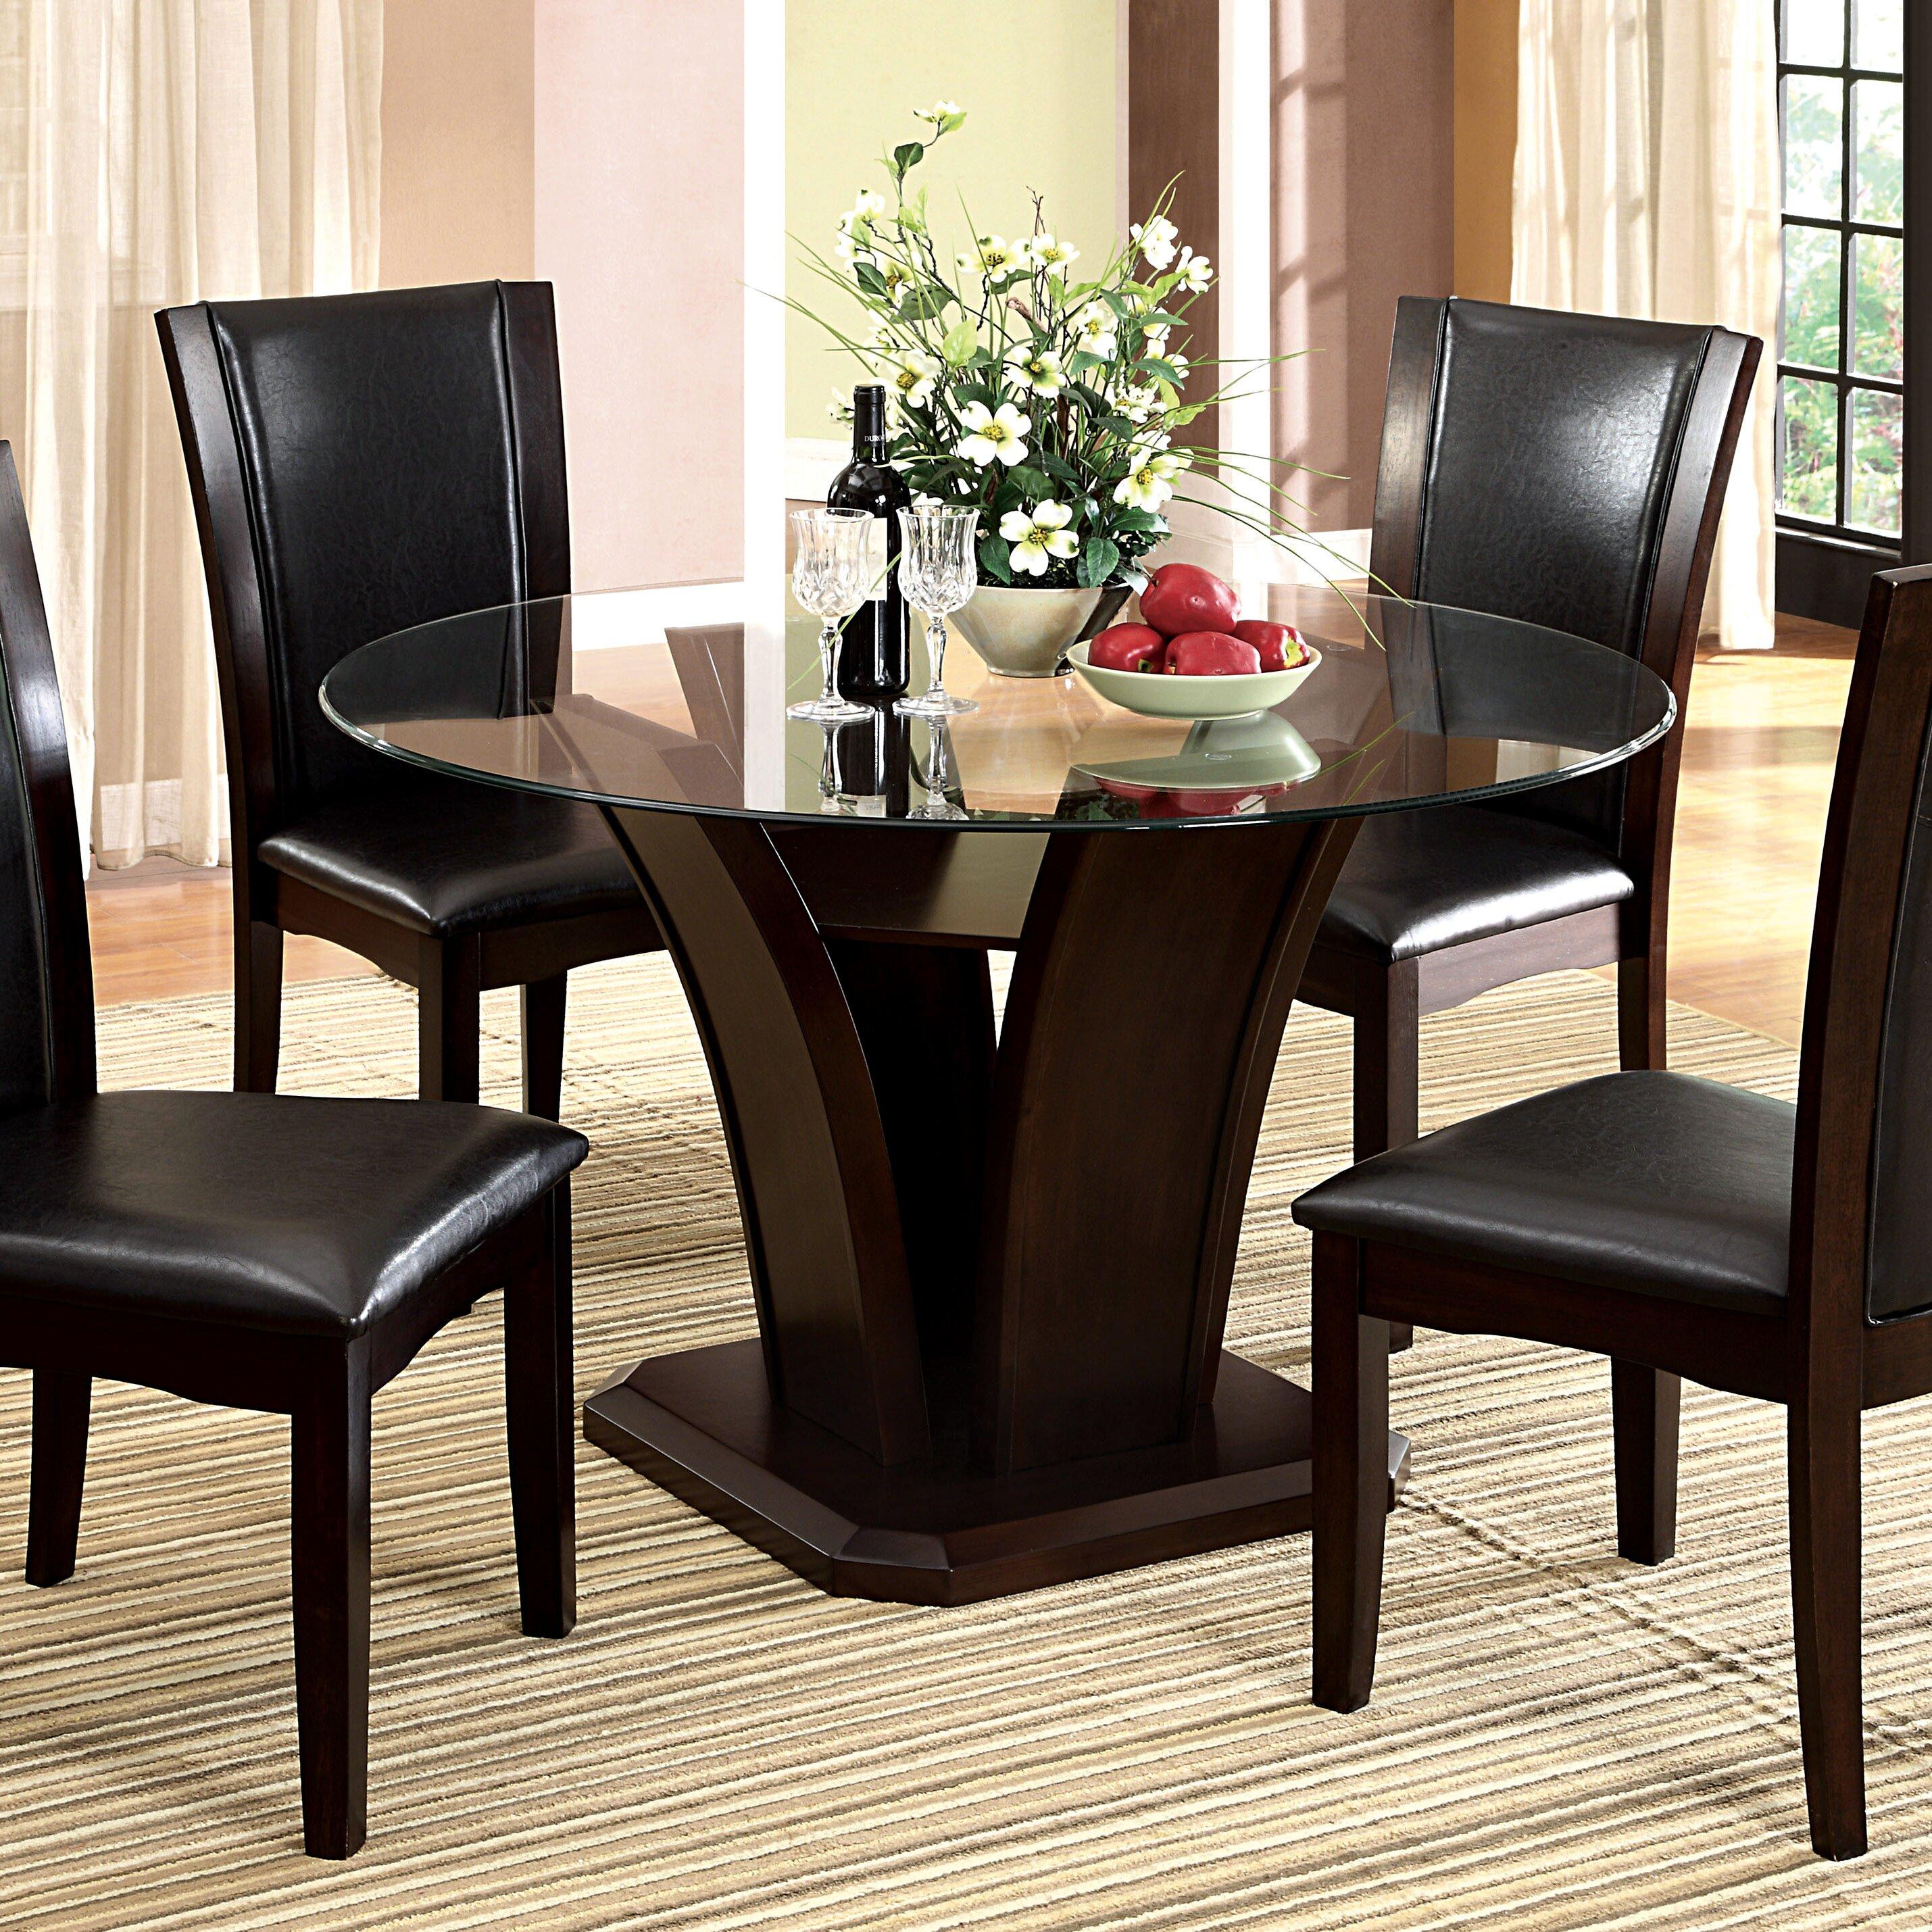 Hokku Designs Upton Round Dining Table Wayfair : Hokku Designs Upton Dining Table JEG 4821SU from www.wayfair.com size 2859 x 2859 jpeg 2113kB